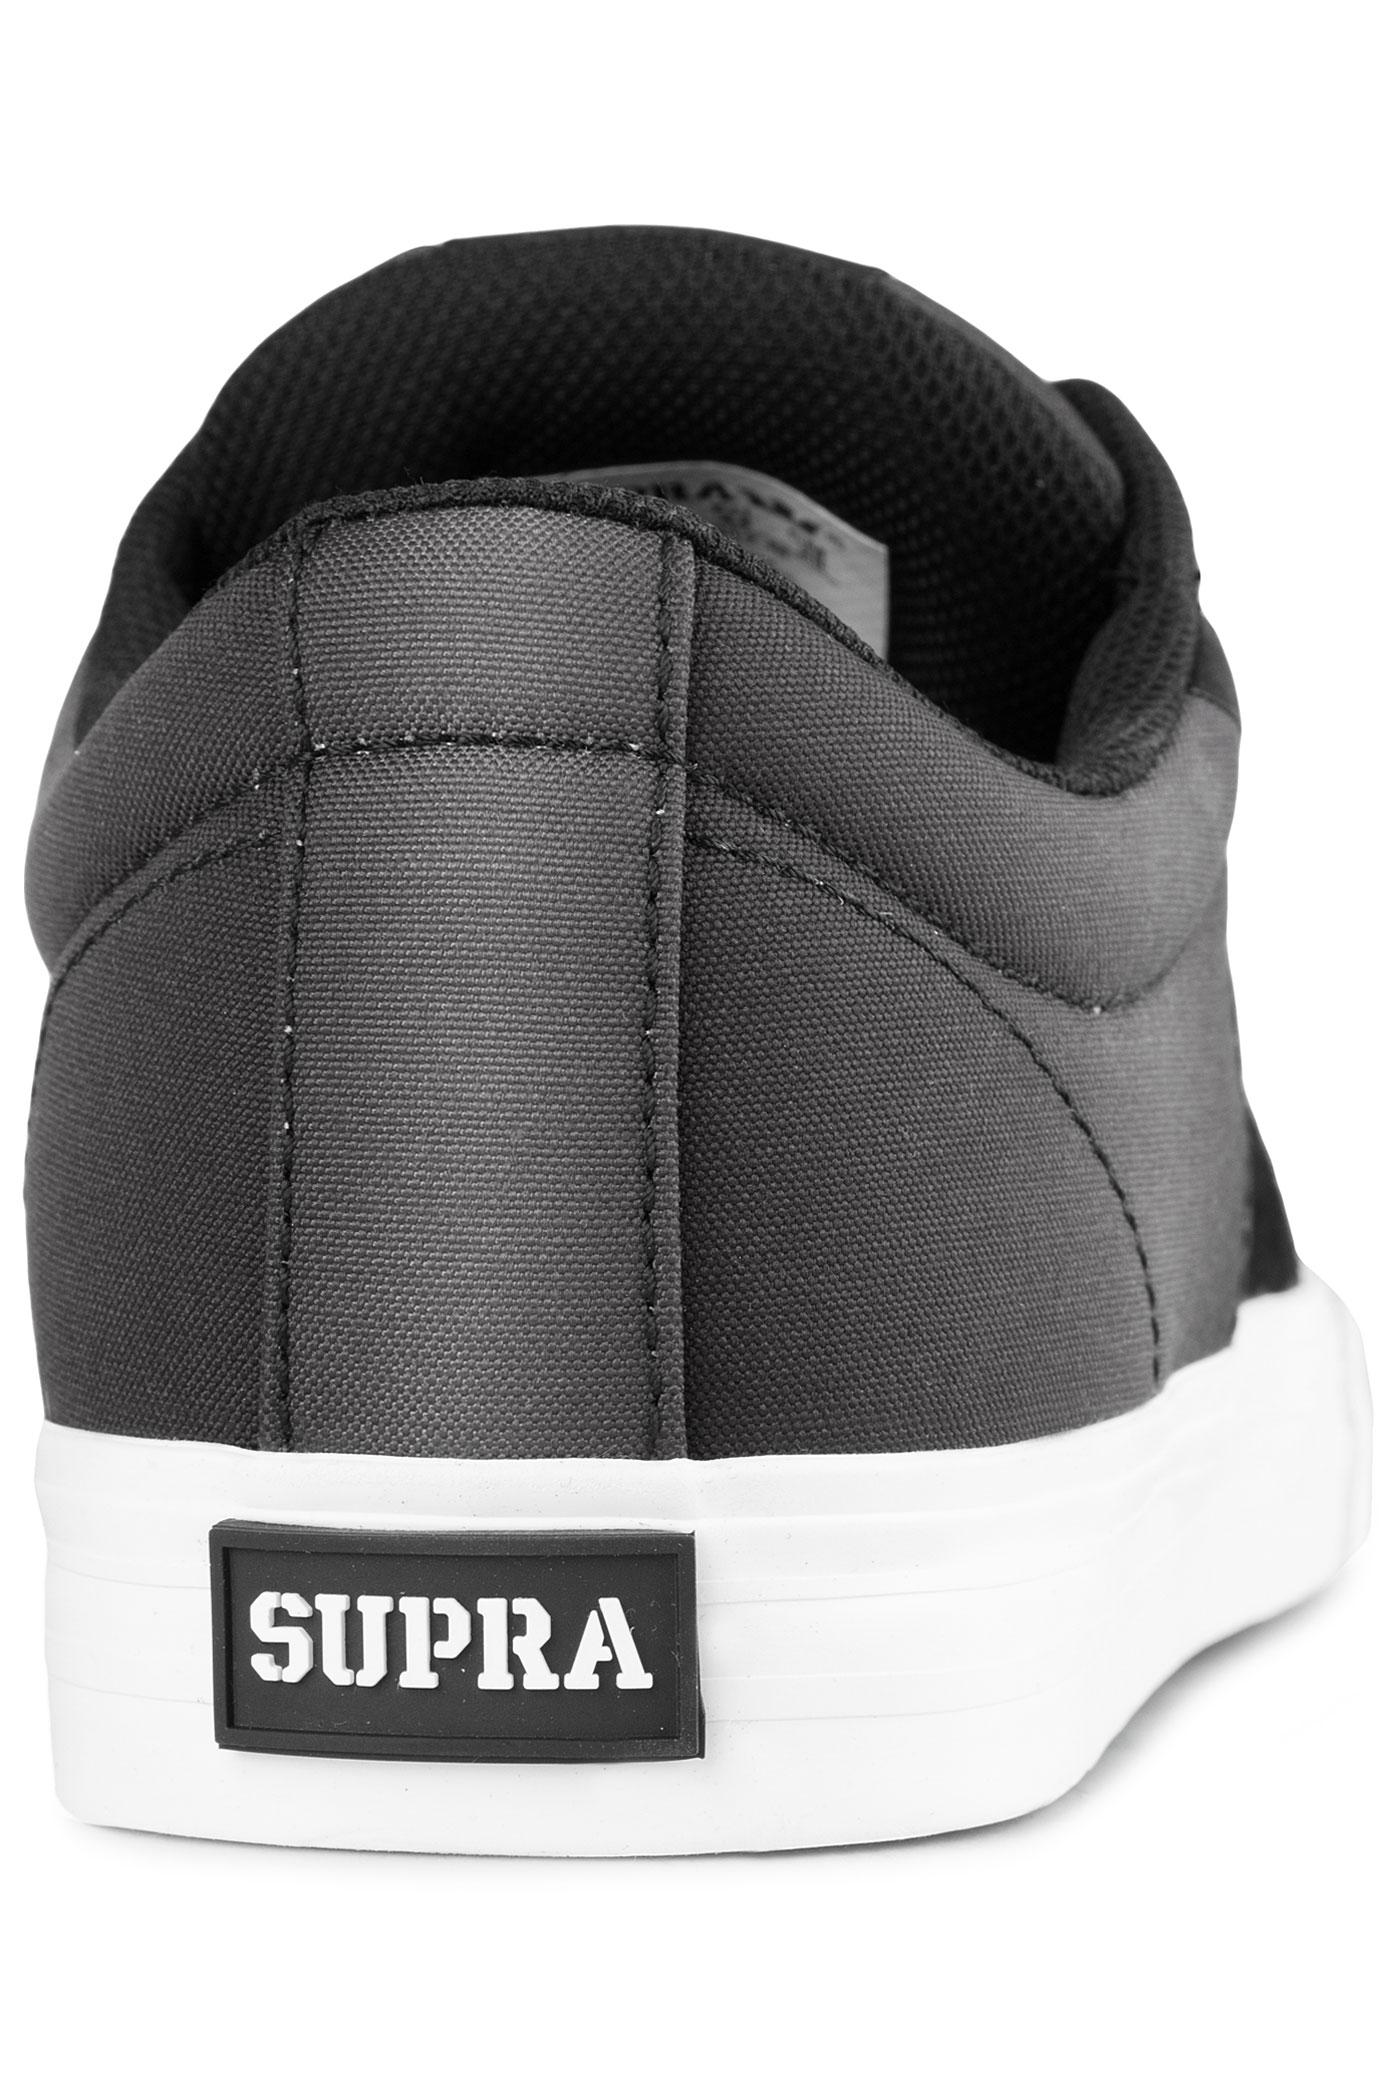 1e96aa6822d9 Supra Stacks Vulc II Shoe (black black fade white) buy at skatedeluxe